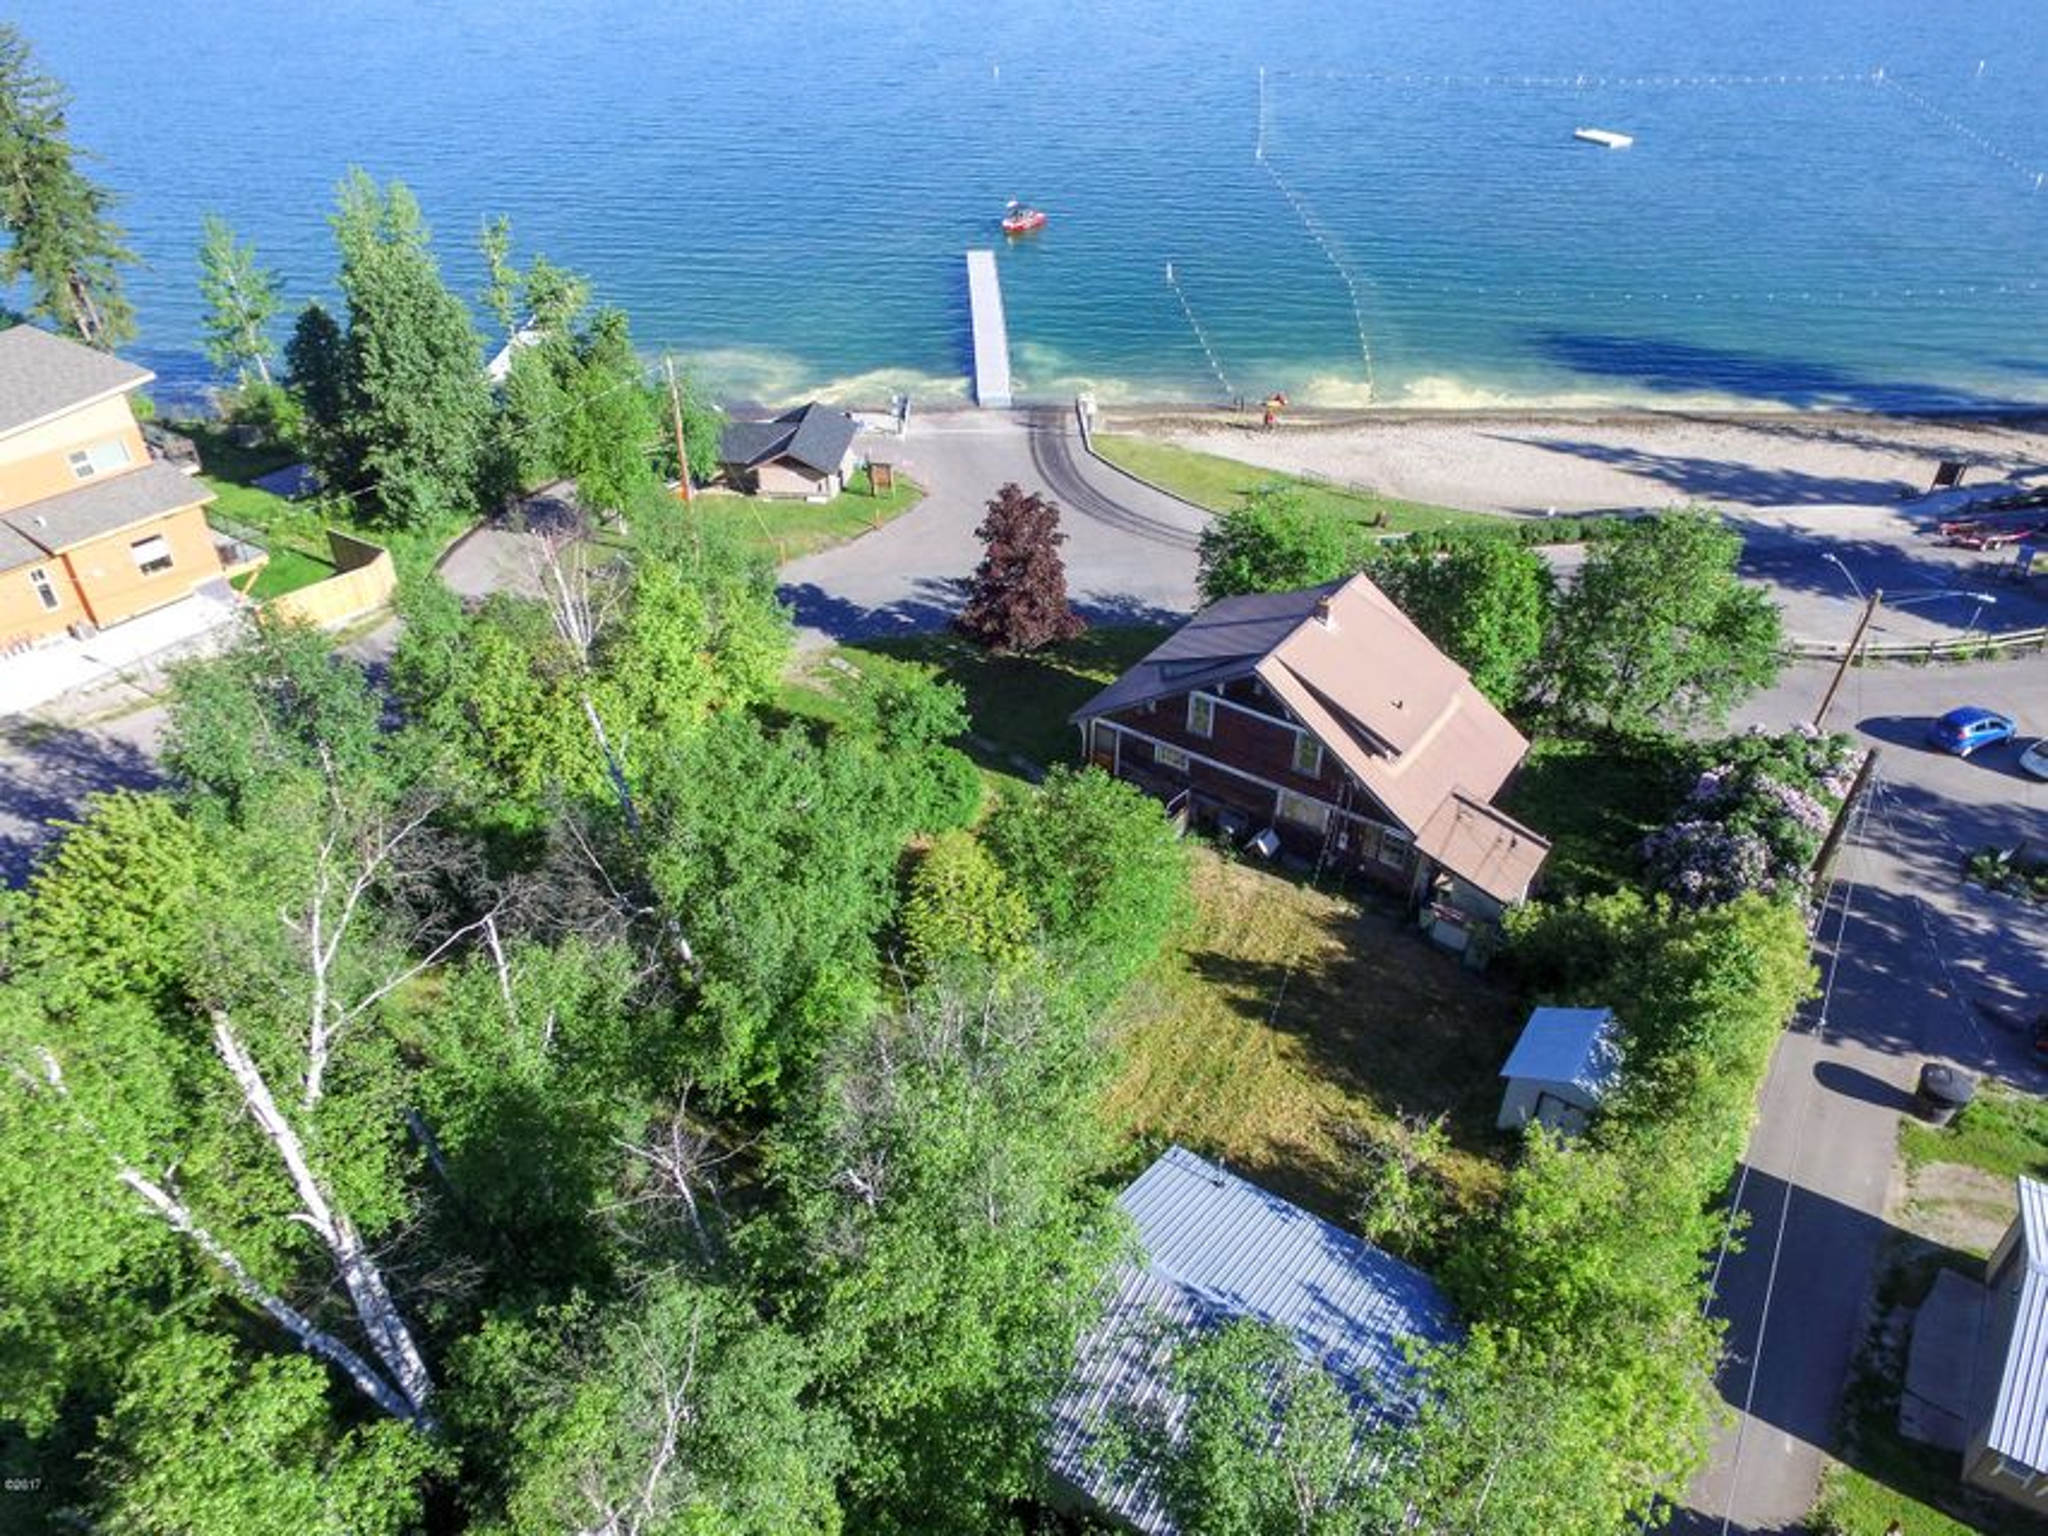 Land for Sale at 1 Lakeside Boulevard Whitefish, Montana 59937 United States